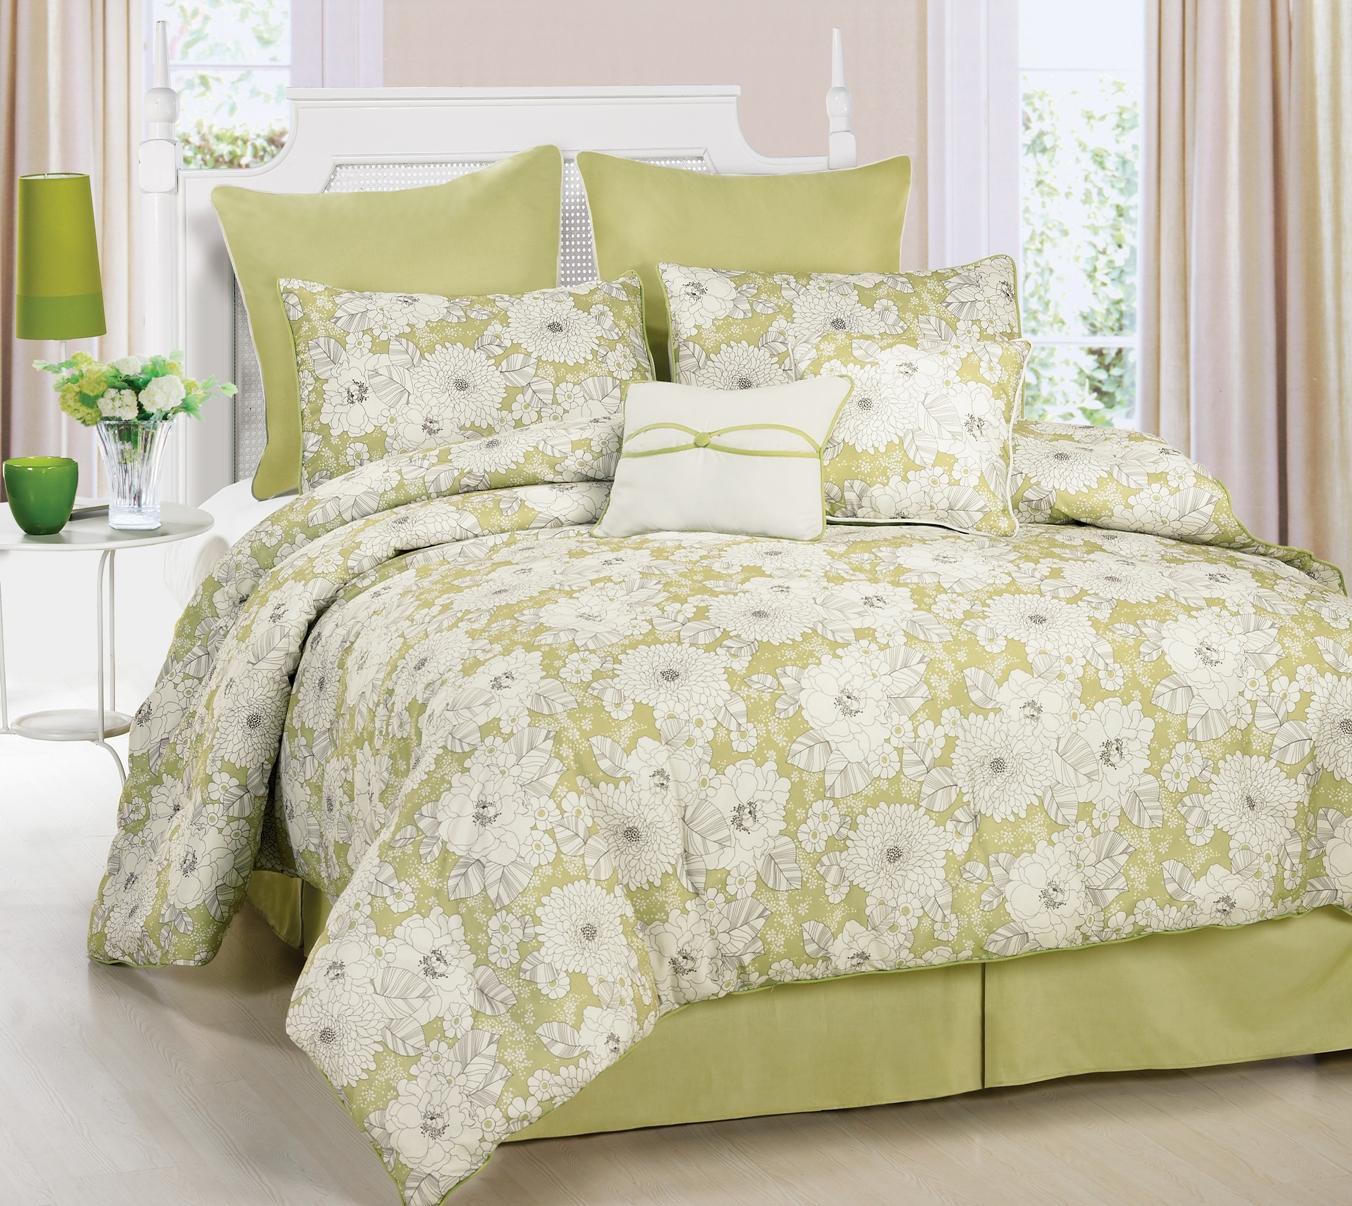 Calista Floral 4-piece Full/ Queen-size Comforter Set